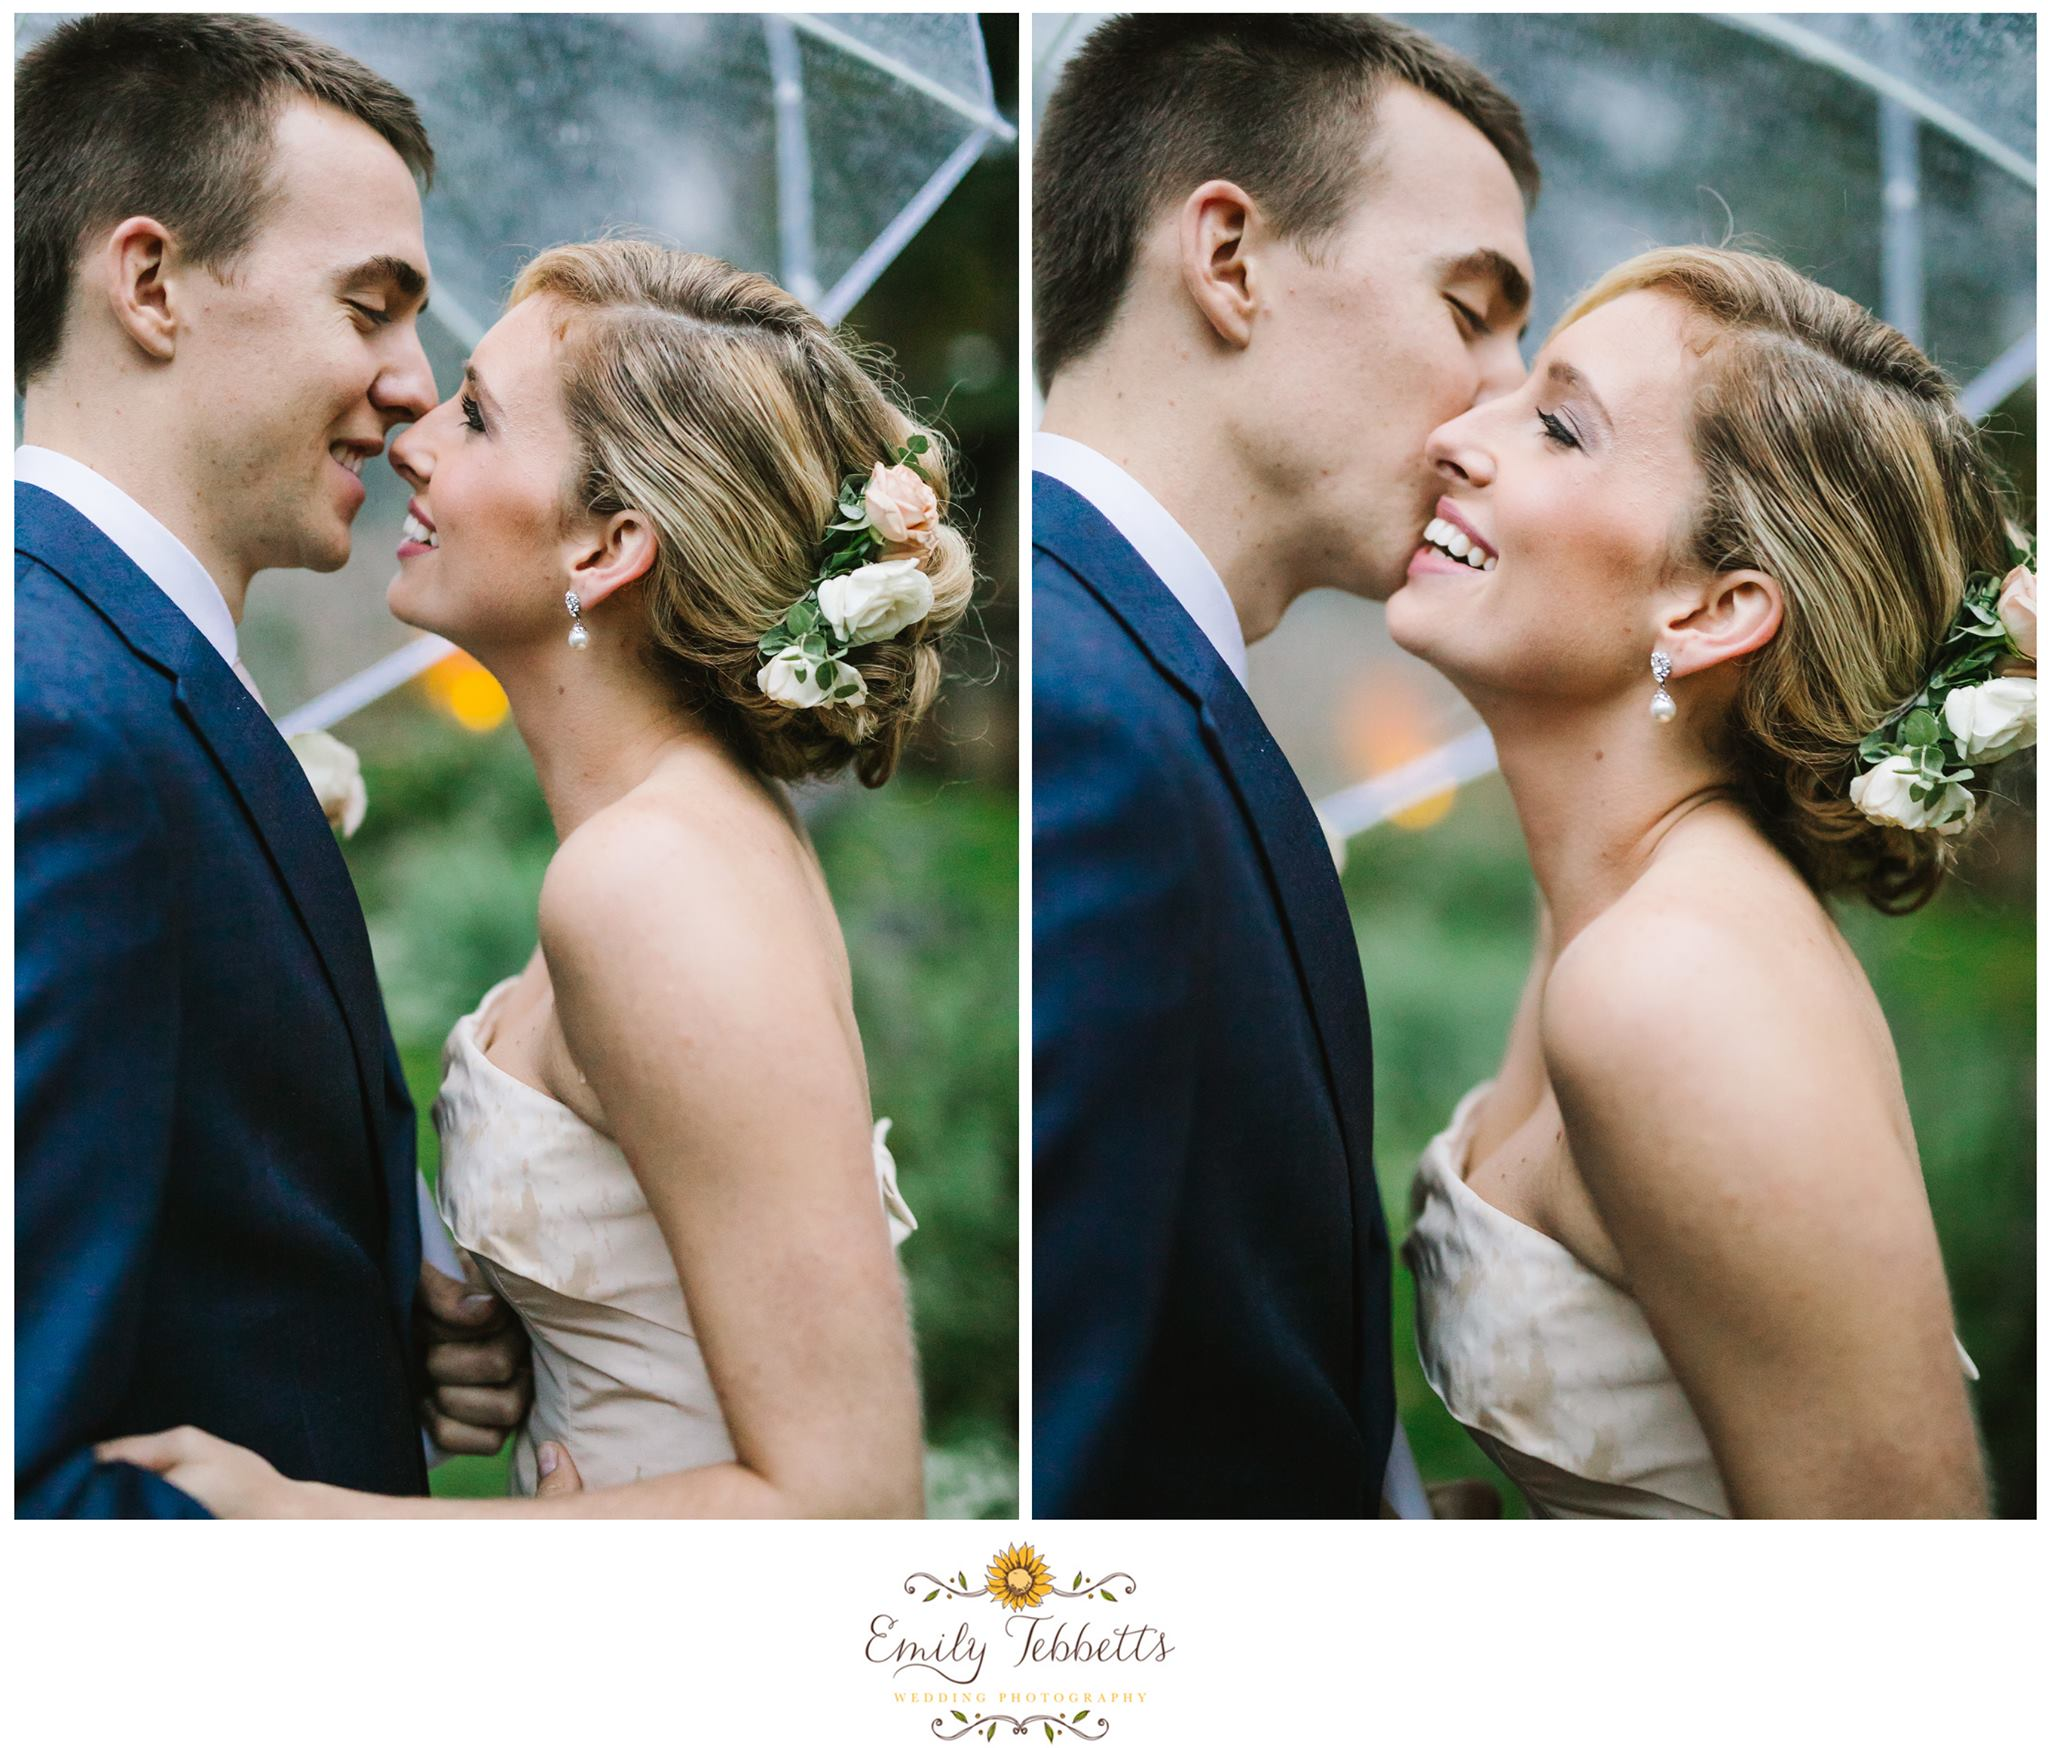 Crane Estate, Ipswich, MA - Emily Tebbetts Wedding Photography 5.jpg